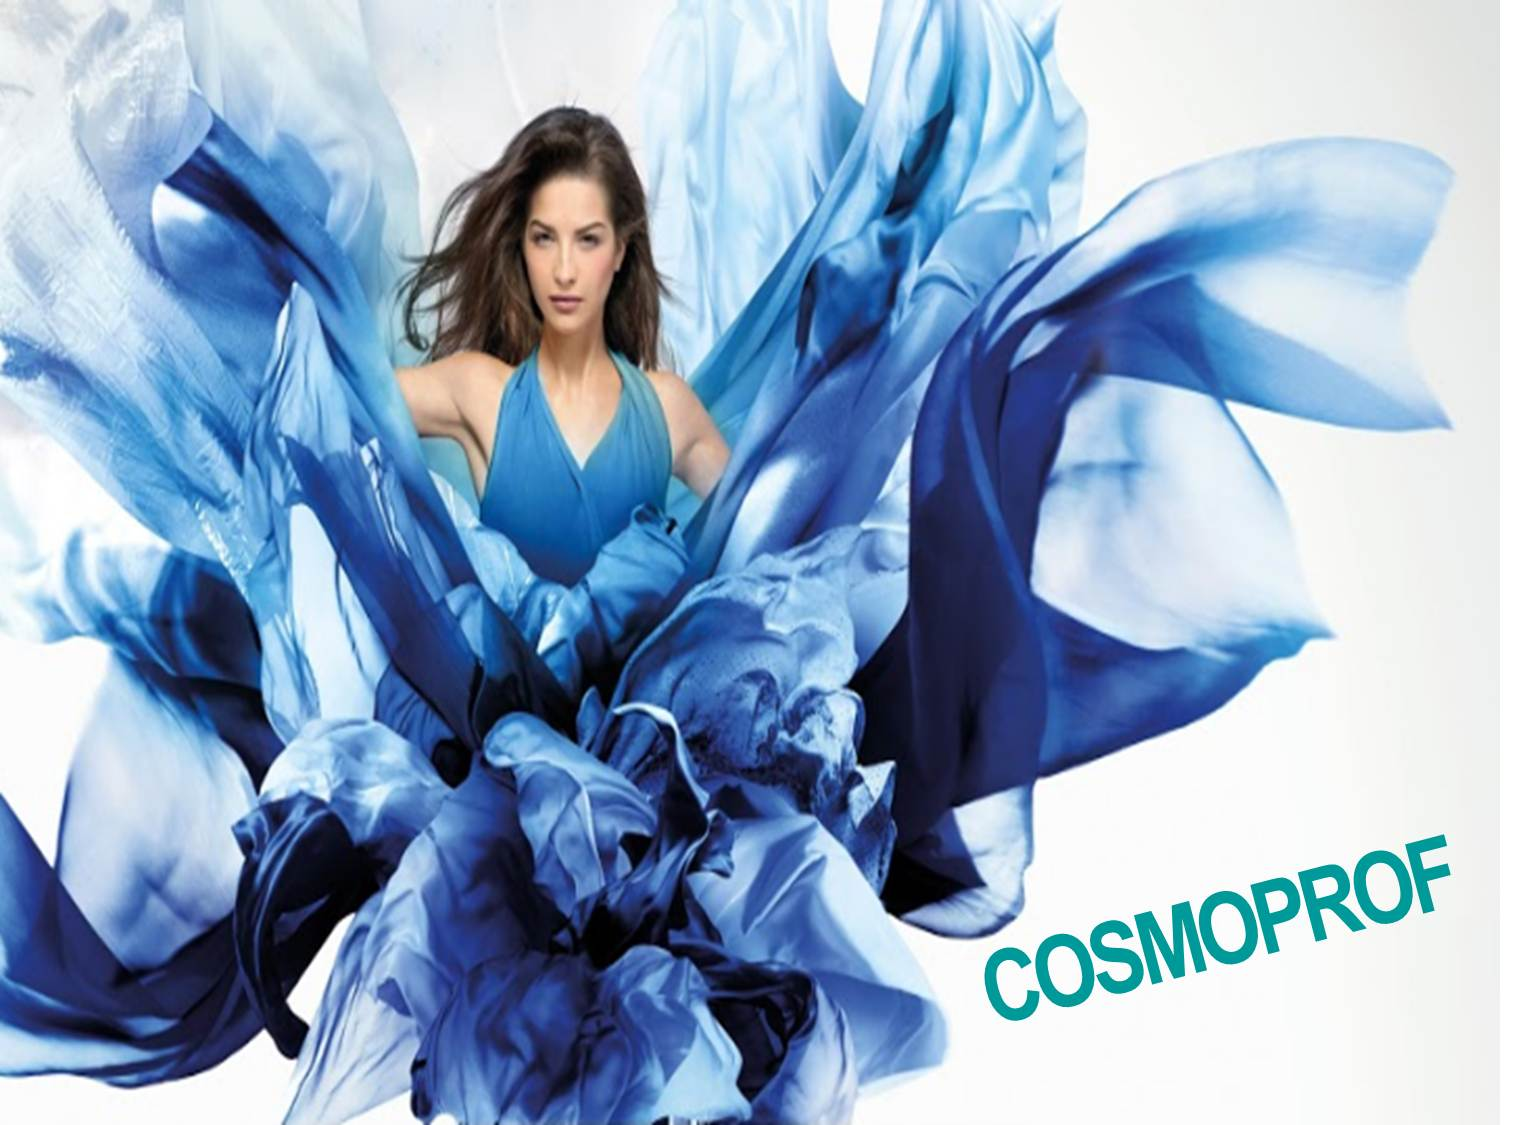 COSMOPROF